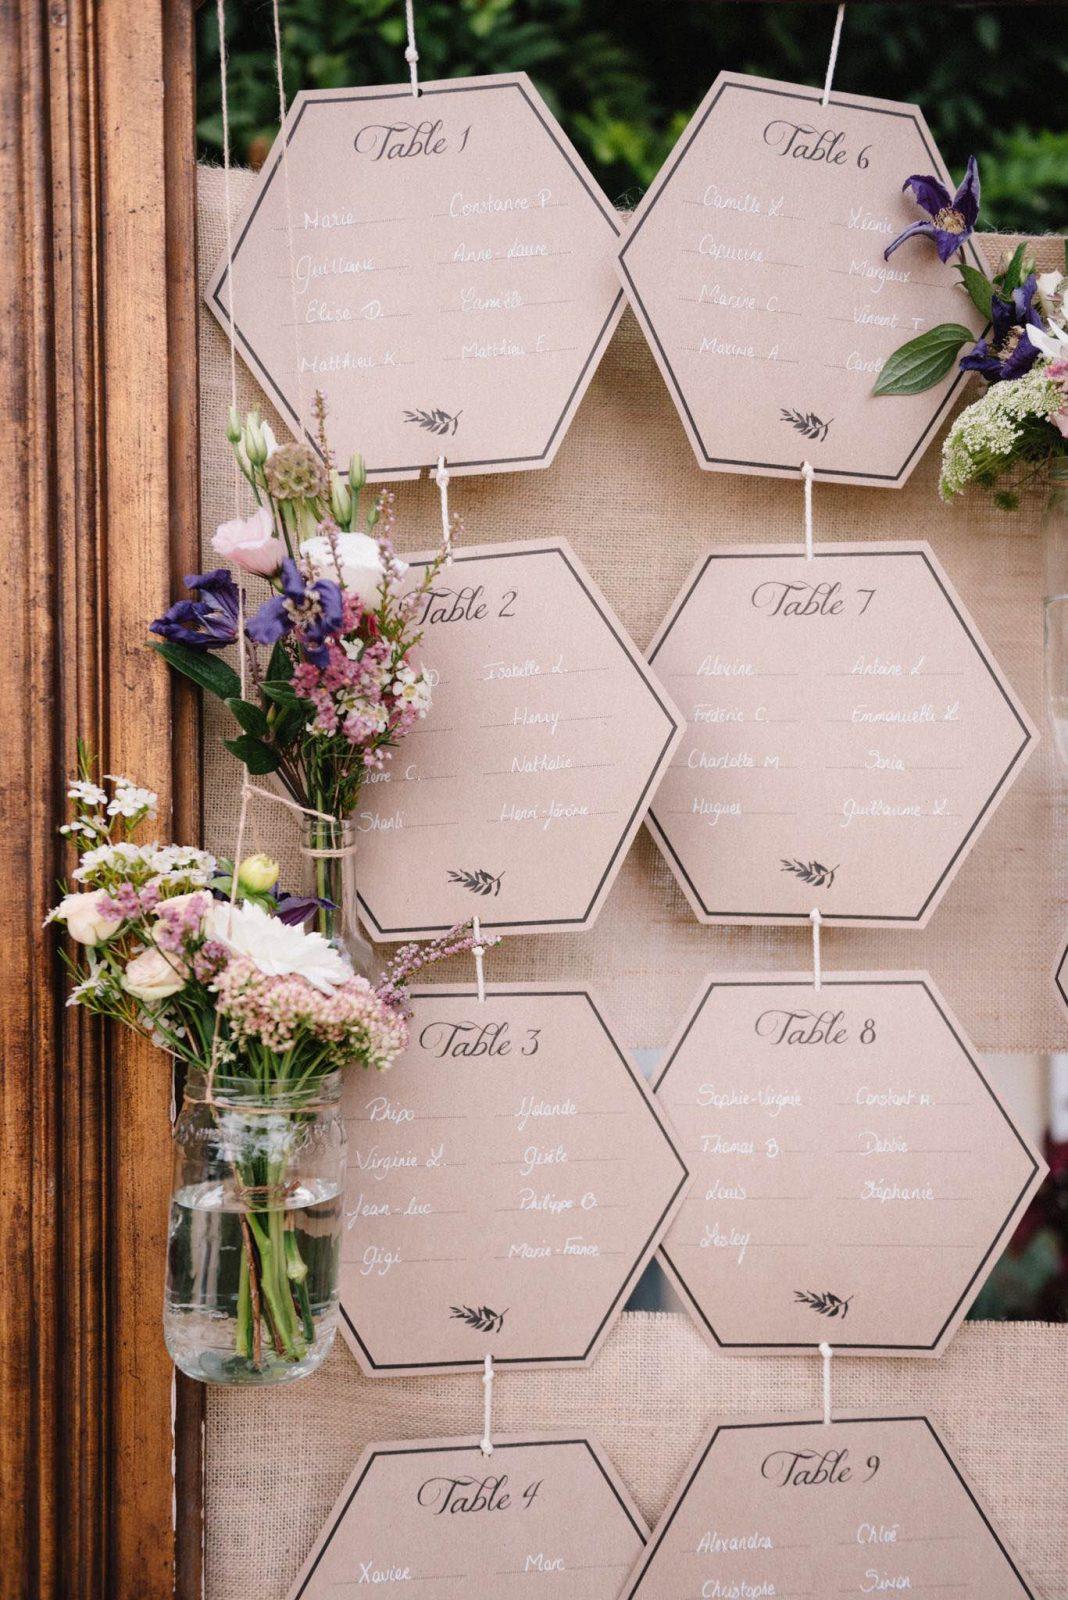 chloe-lapeyssonnie-photographe-faire-part-mariage-personnalise-jaune-bleu-kraft-triangle-hexagone2